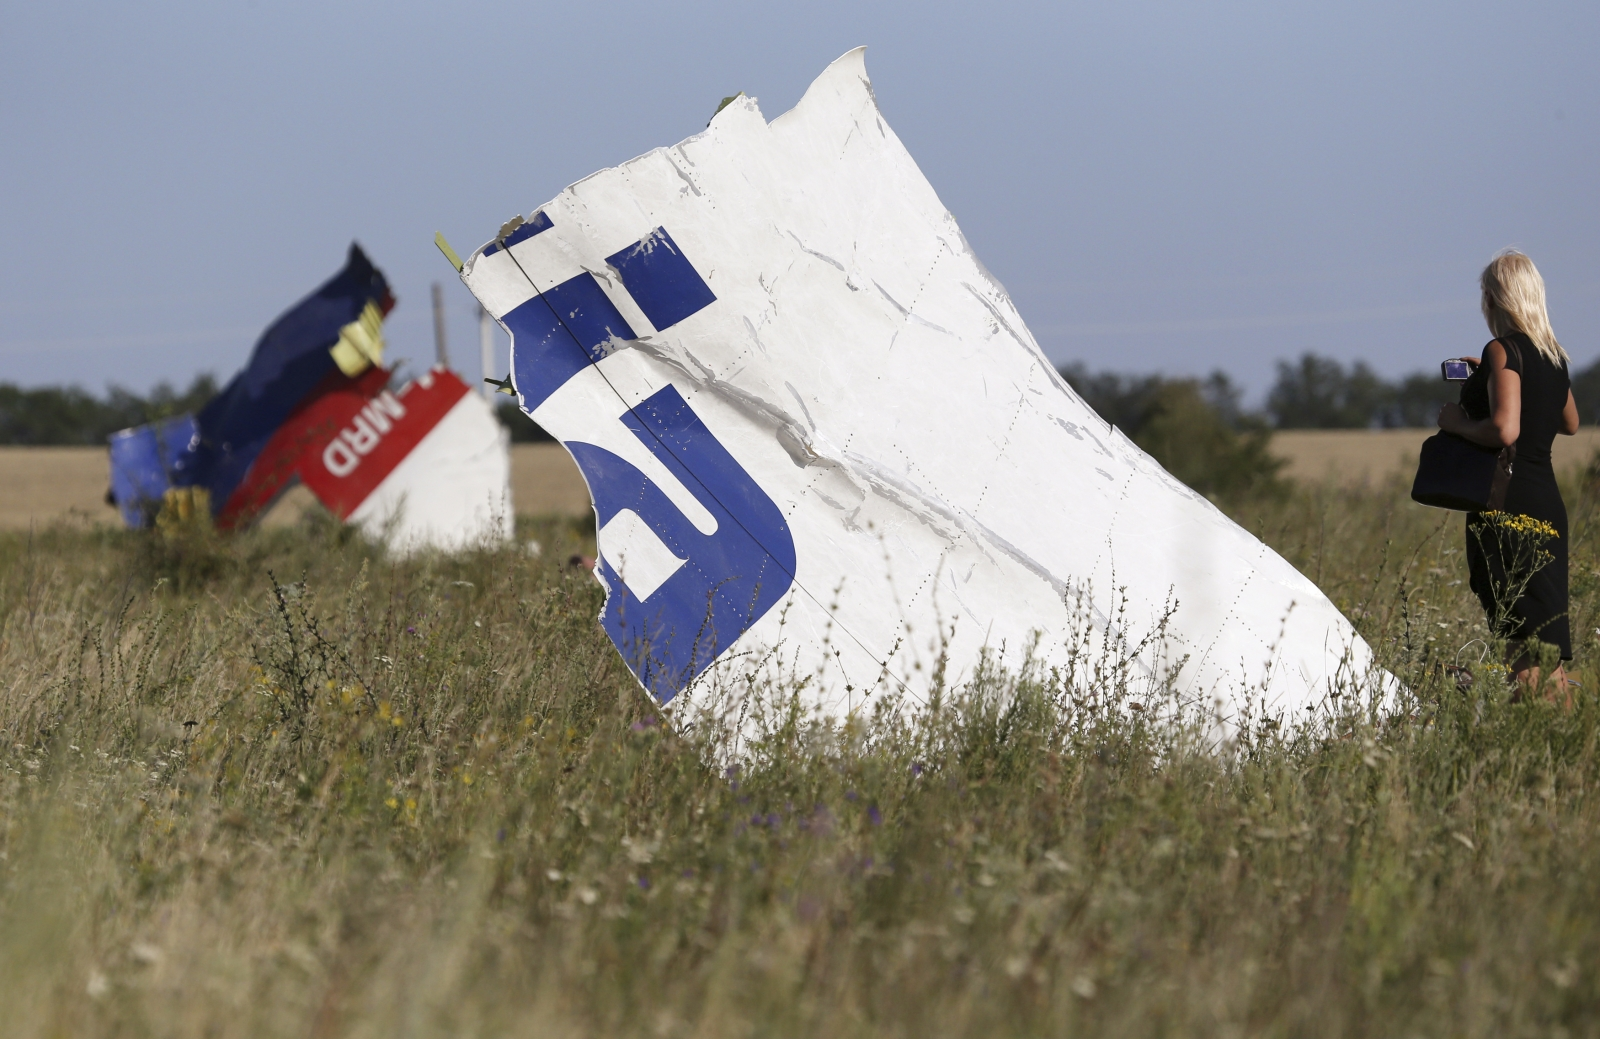 MH17 air disaster